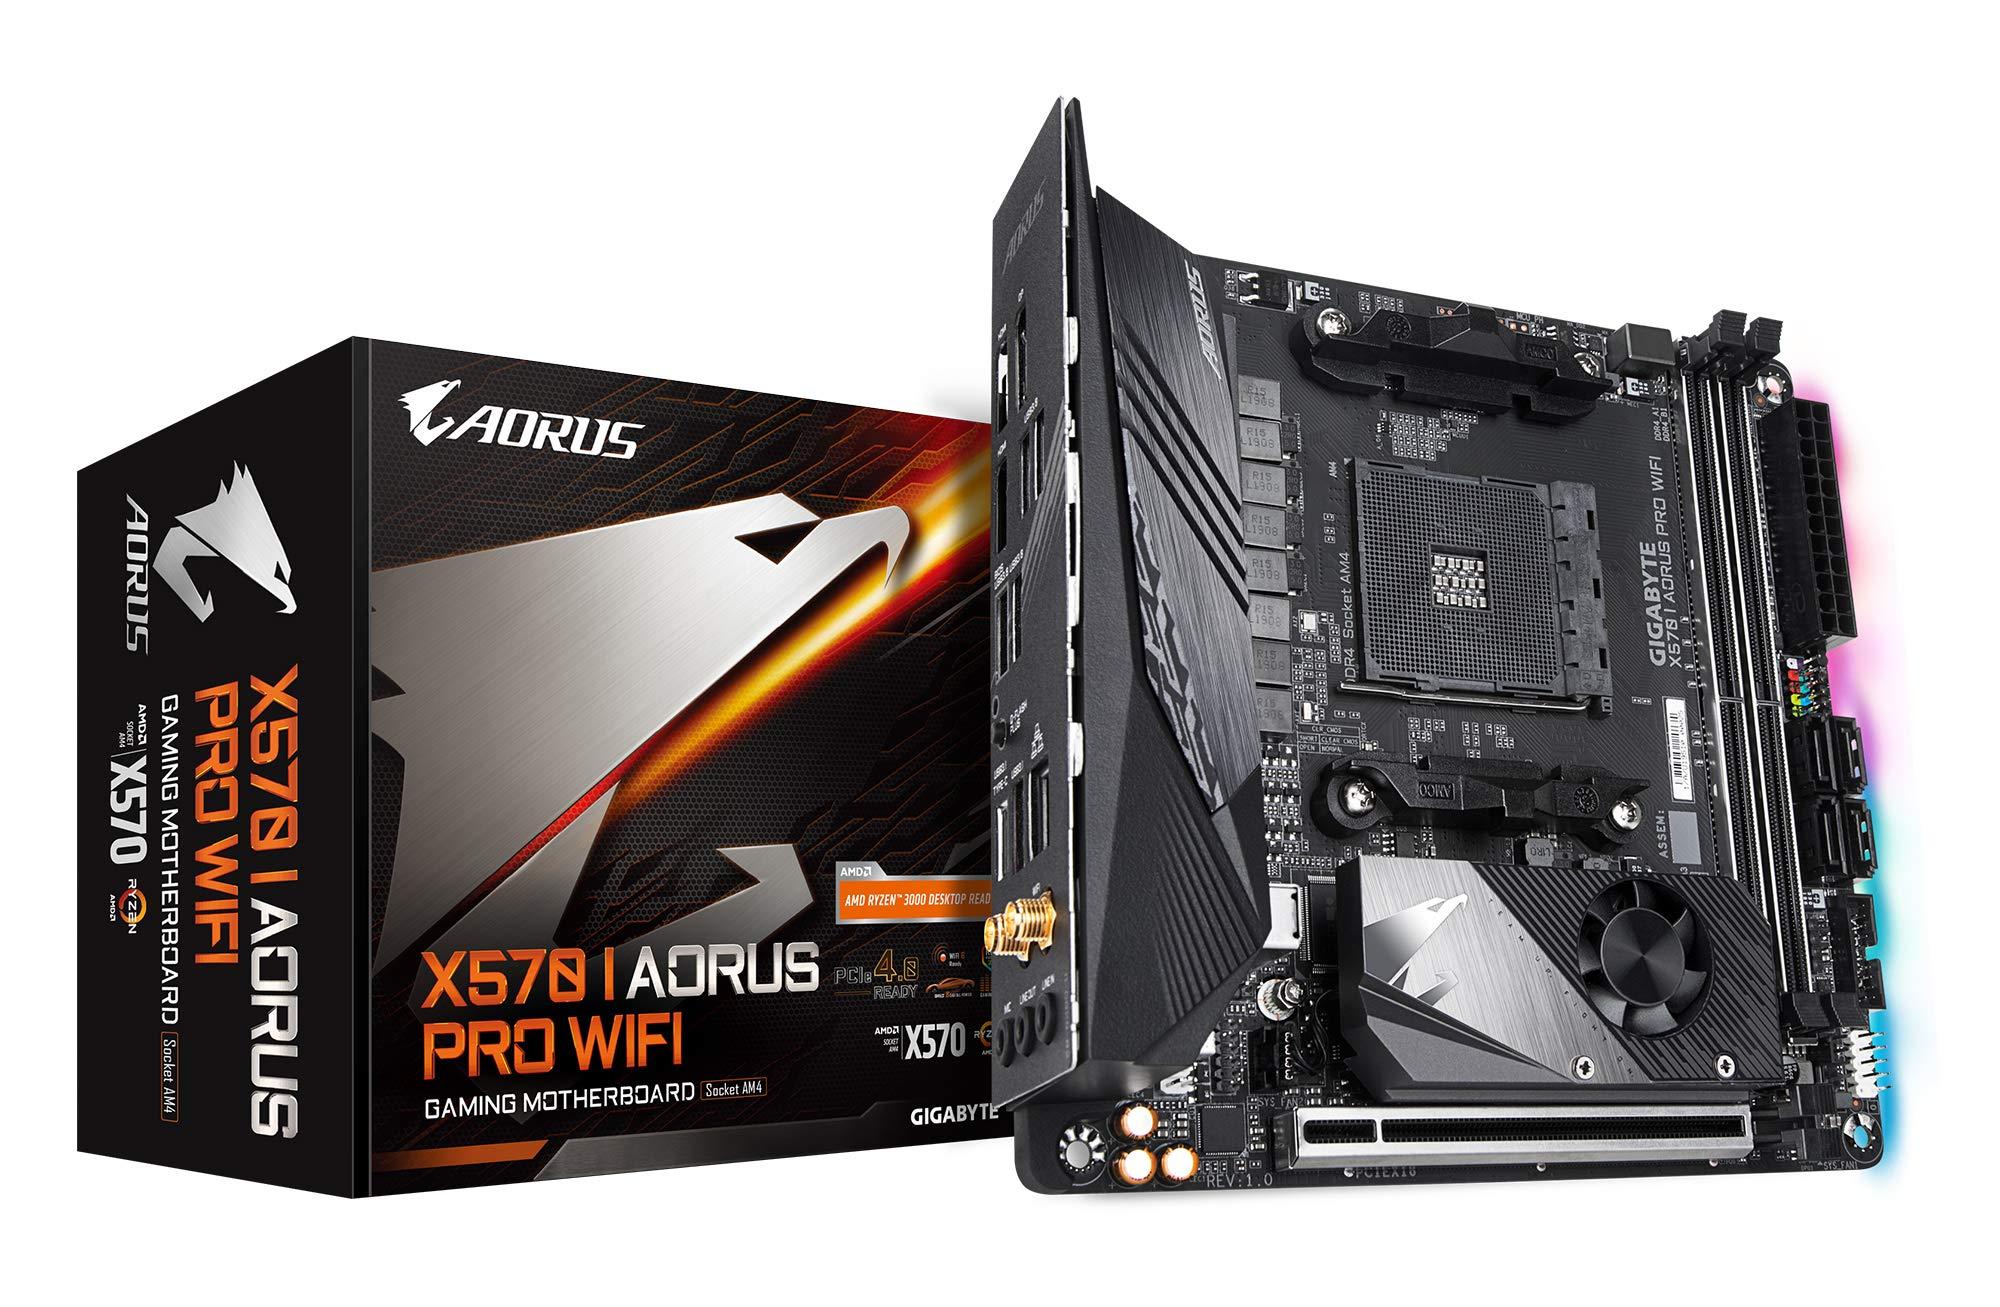 Gigabyte X570 I Aorus Pro Wifi (amd Ryzen 3000/x570/mini-...